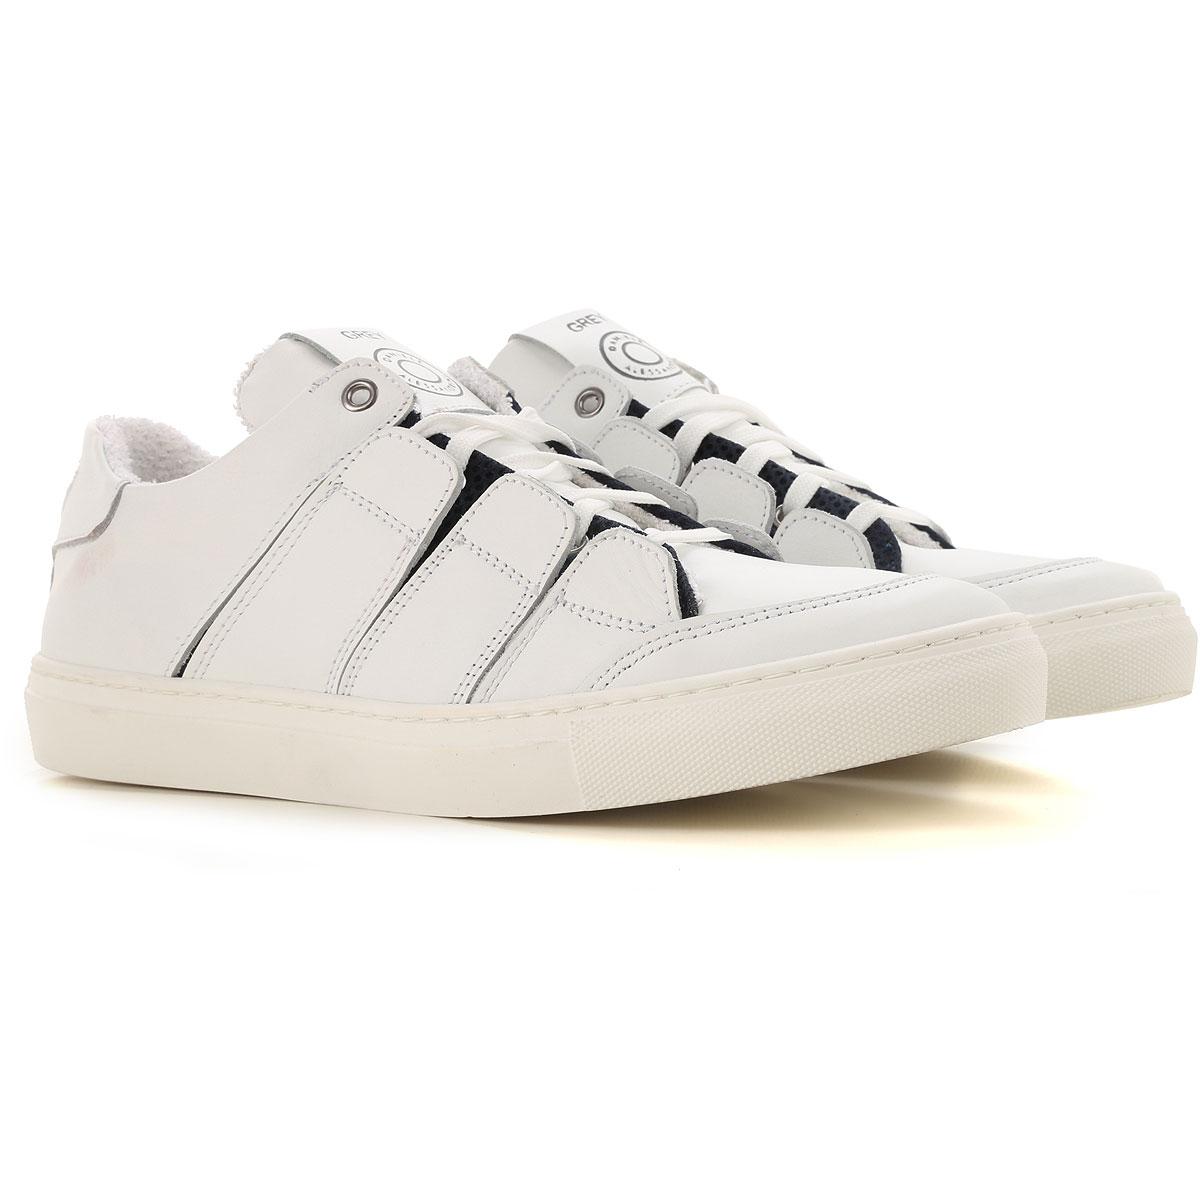 Daniele Alessandrini Sneaker Homme, Blanc, Cuir, 2017, 40 41 42 43 44